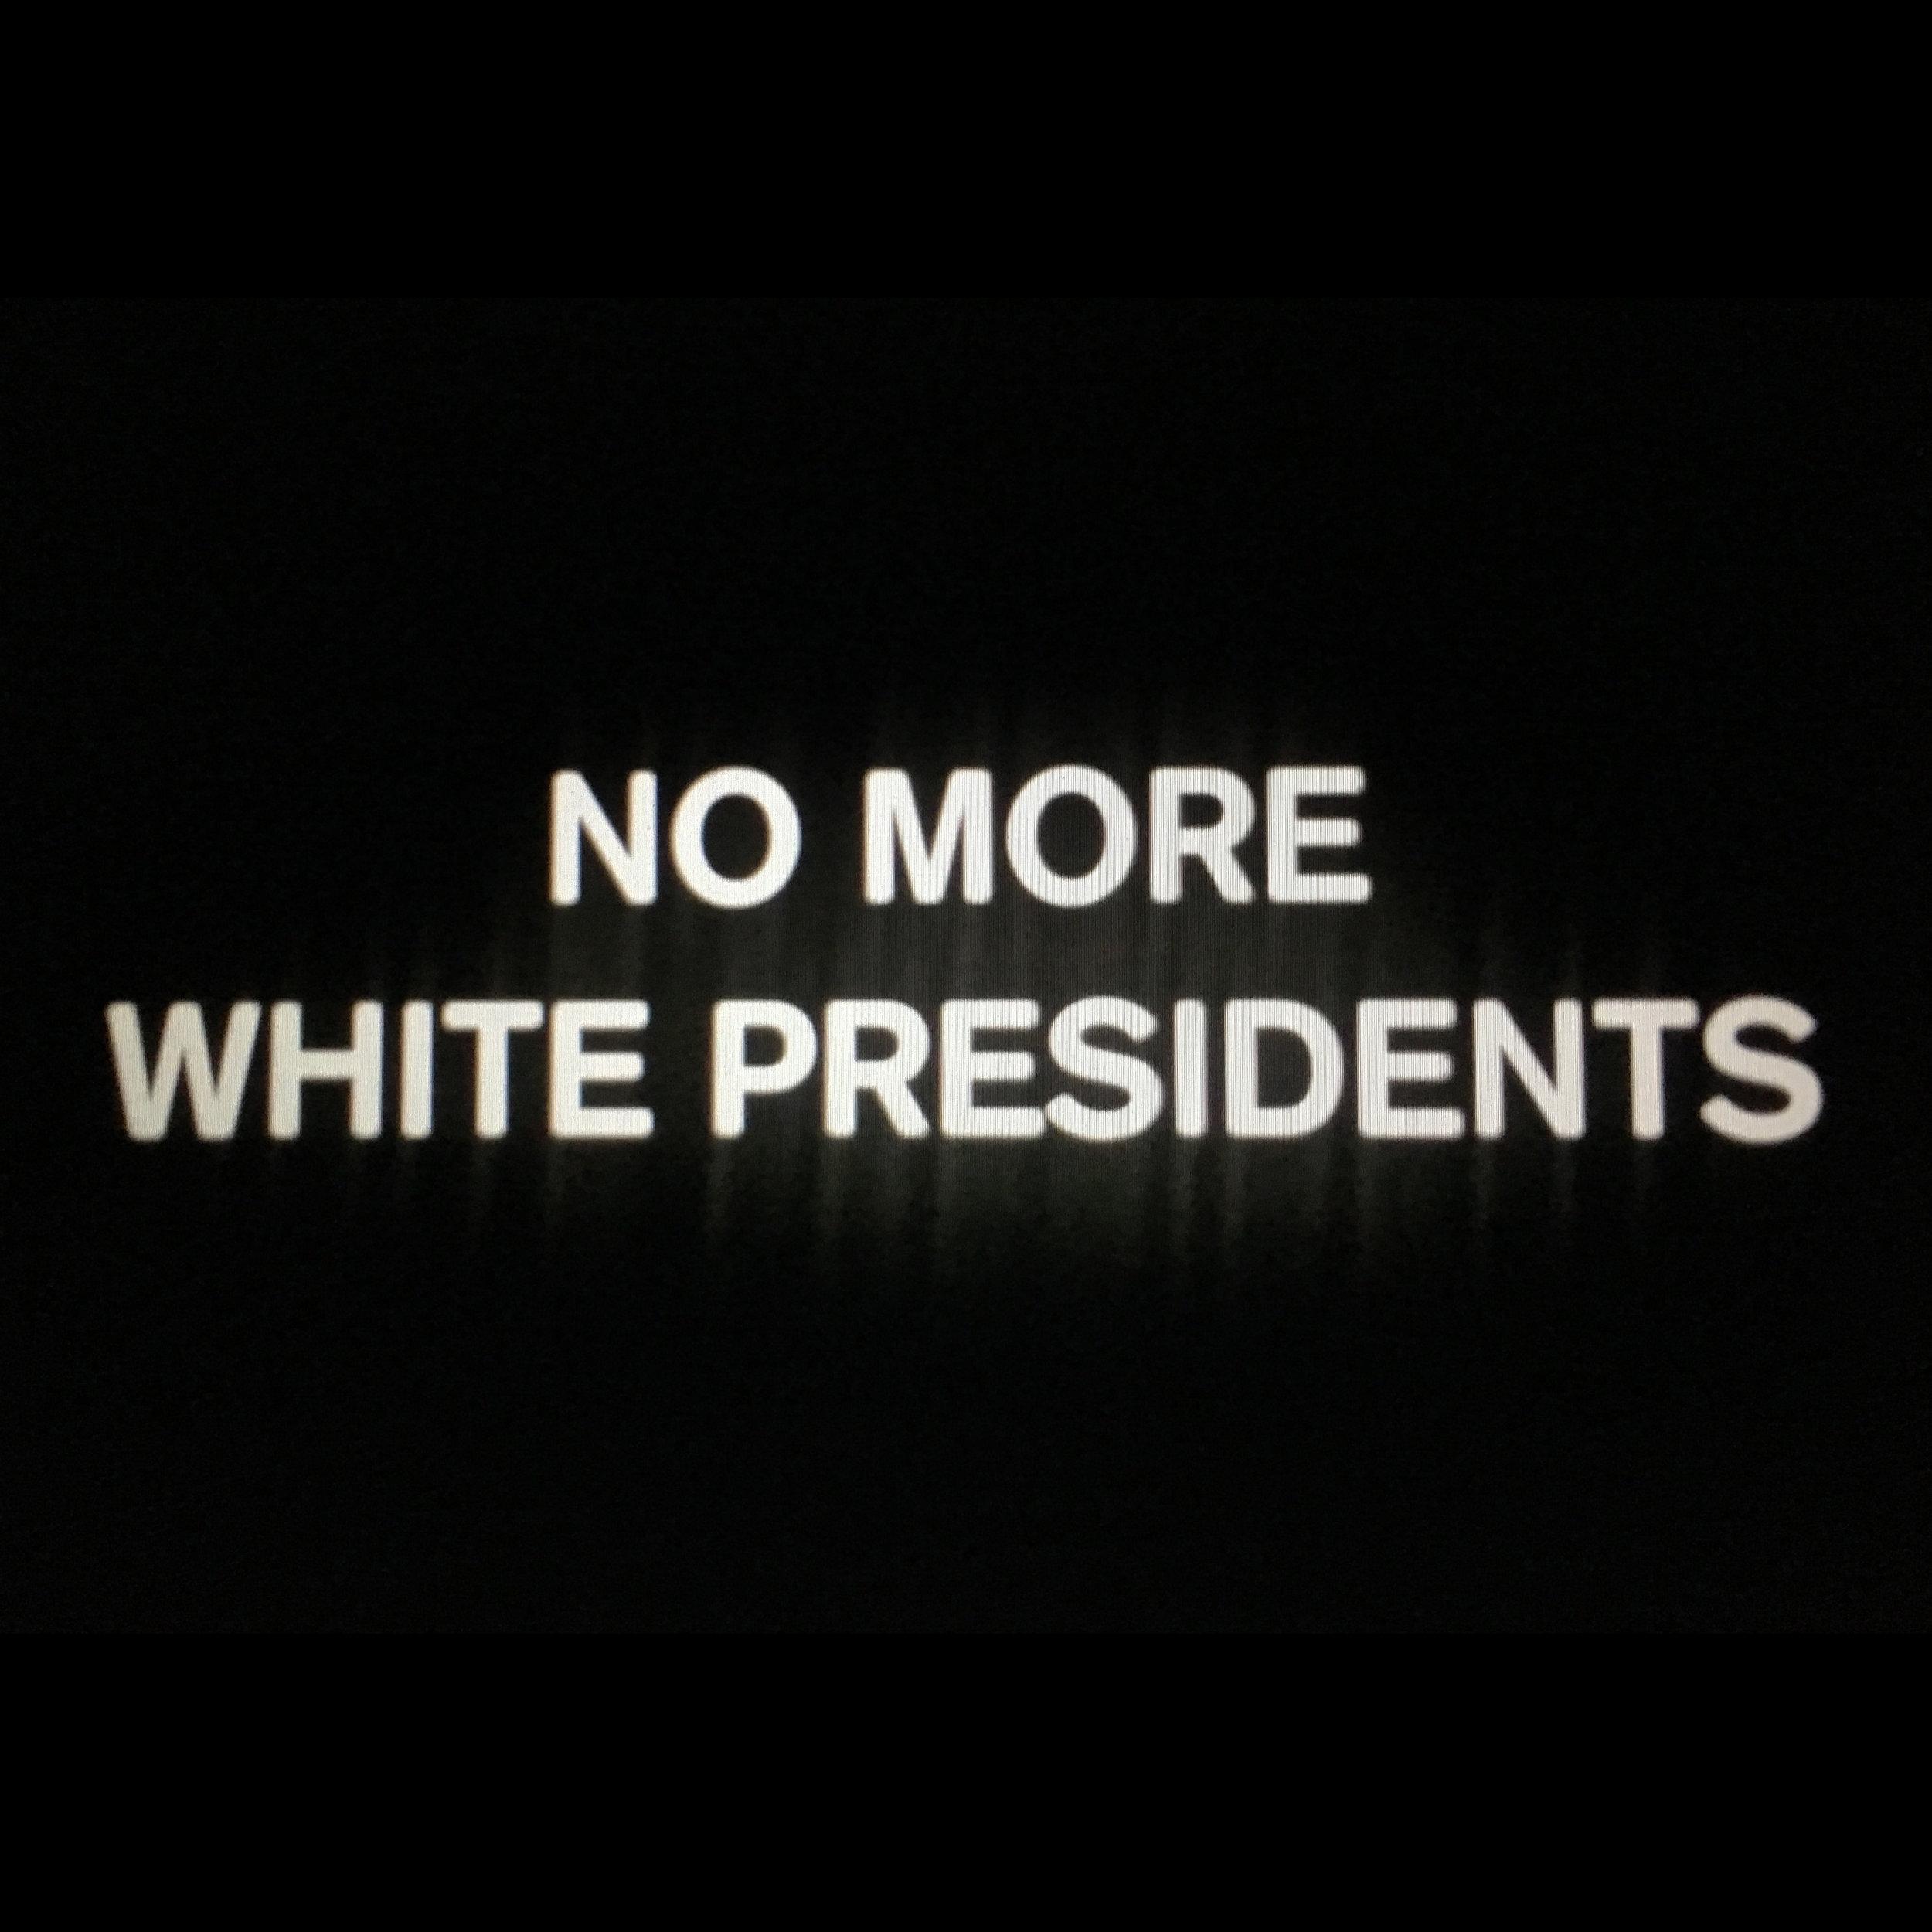 No More White Presidents Soundtrack